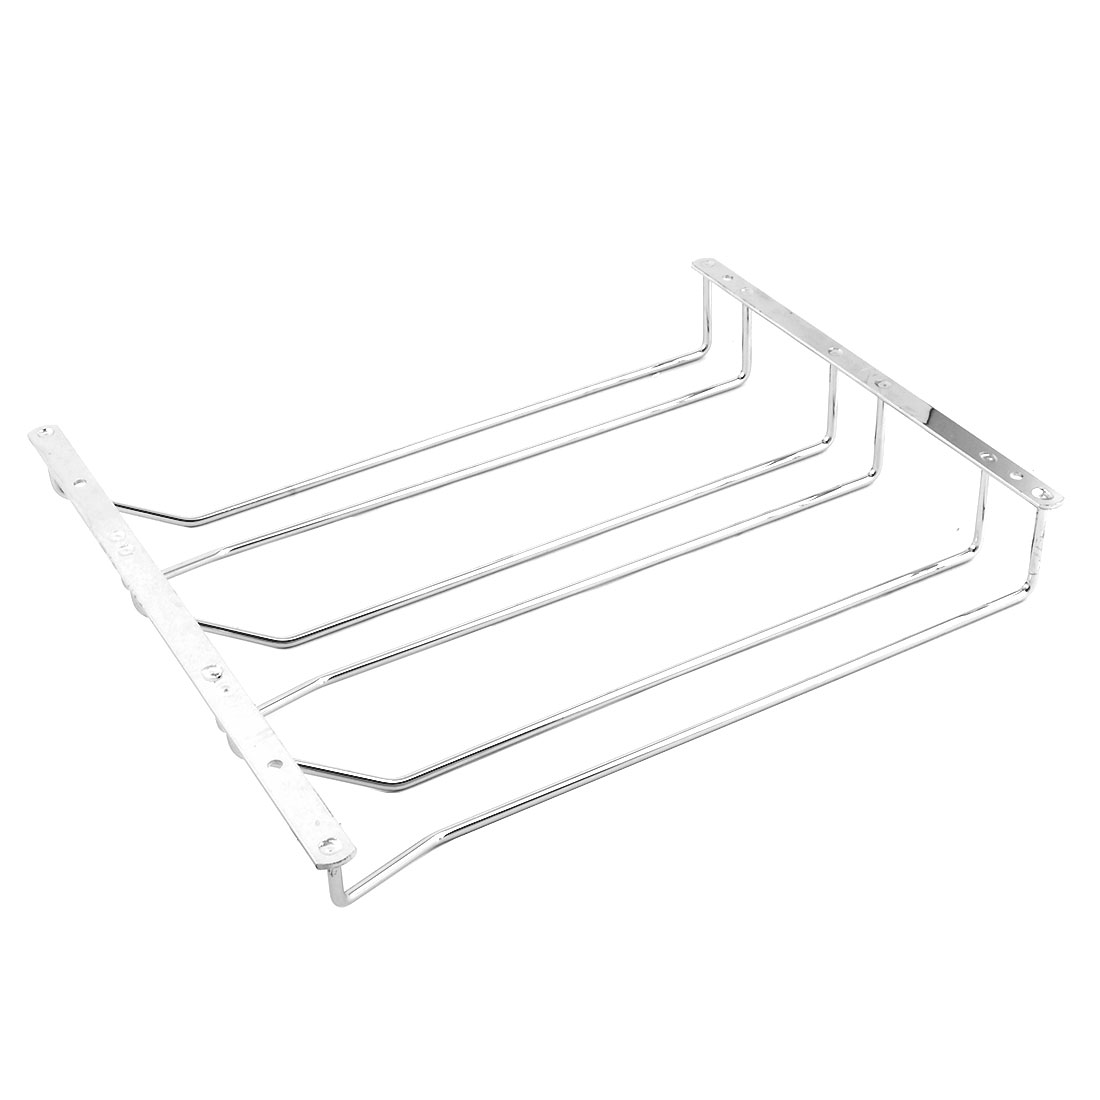 Bar Stainless Steel 3 Rows Design Wine Glass Cup Hanger Shelf Rack 35.5cm Length